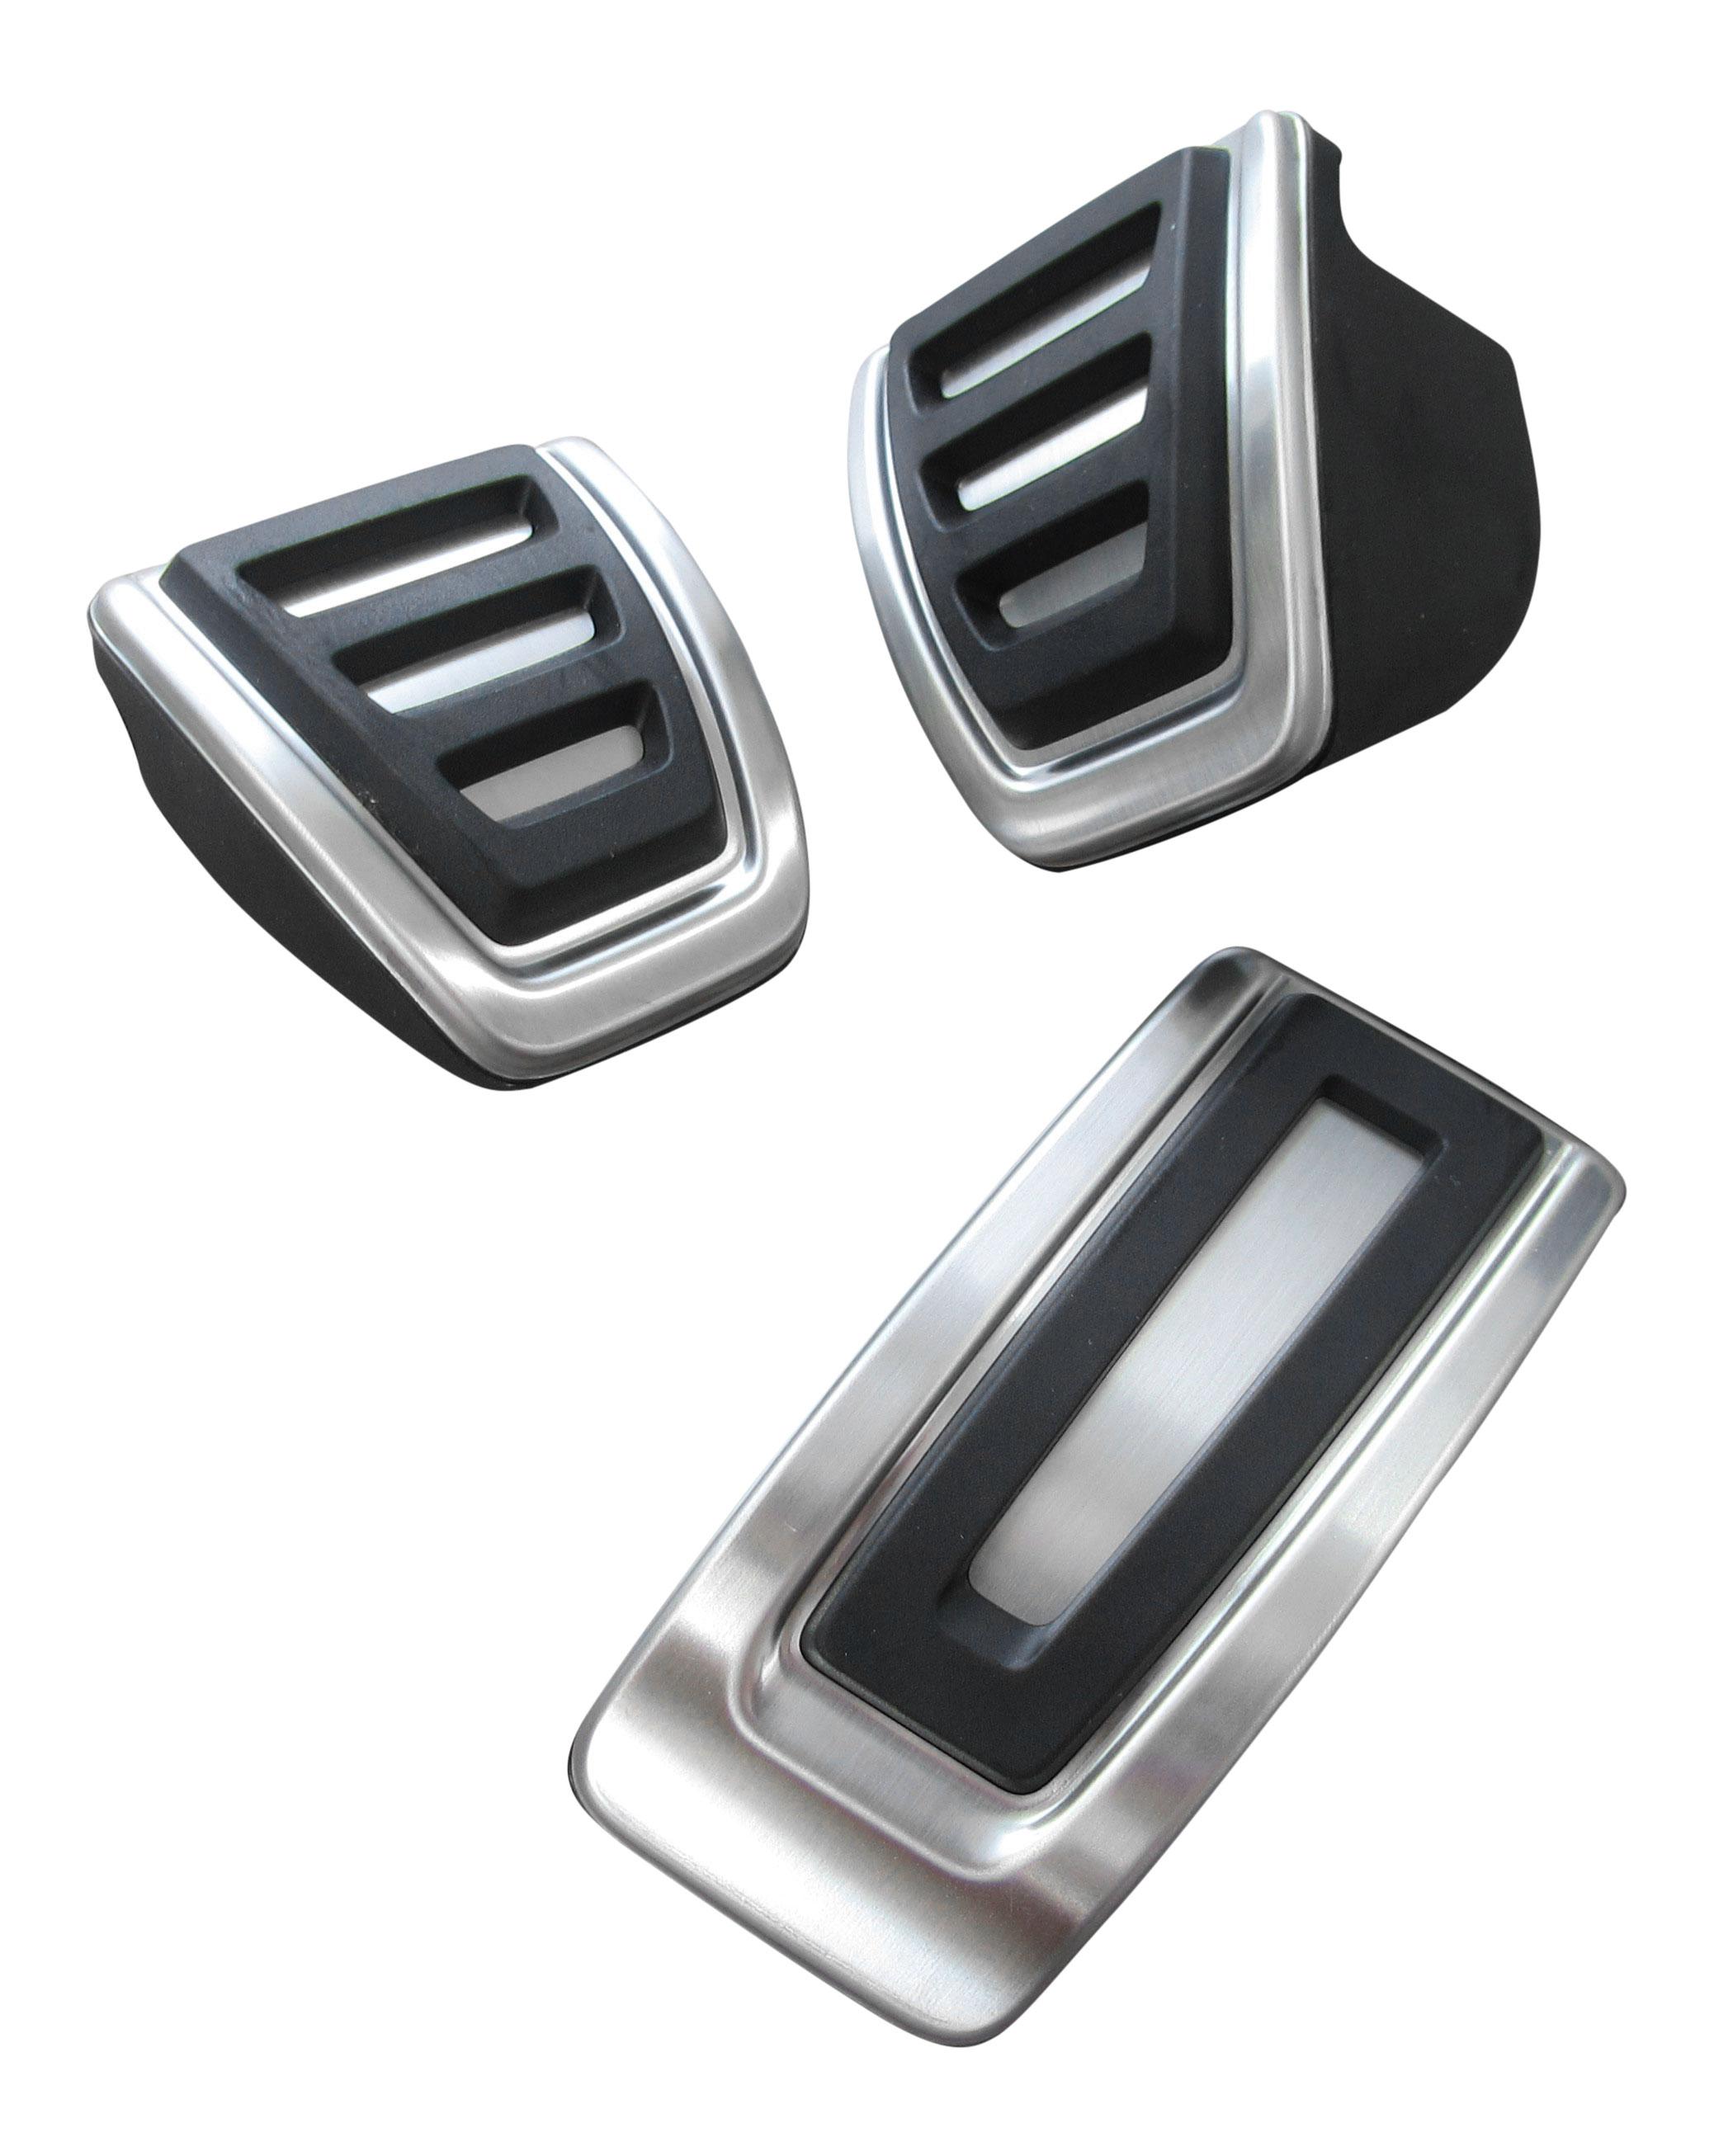 original audi pedale kappen gummi f r schaltung audi a3 s3. Black Bedroom Furniture Sets. Home Design Ideas